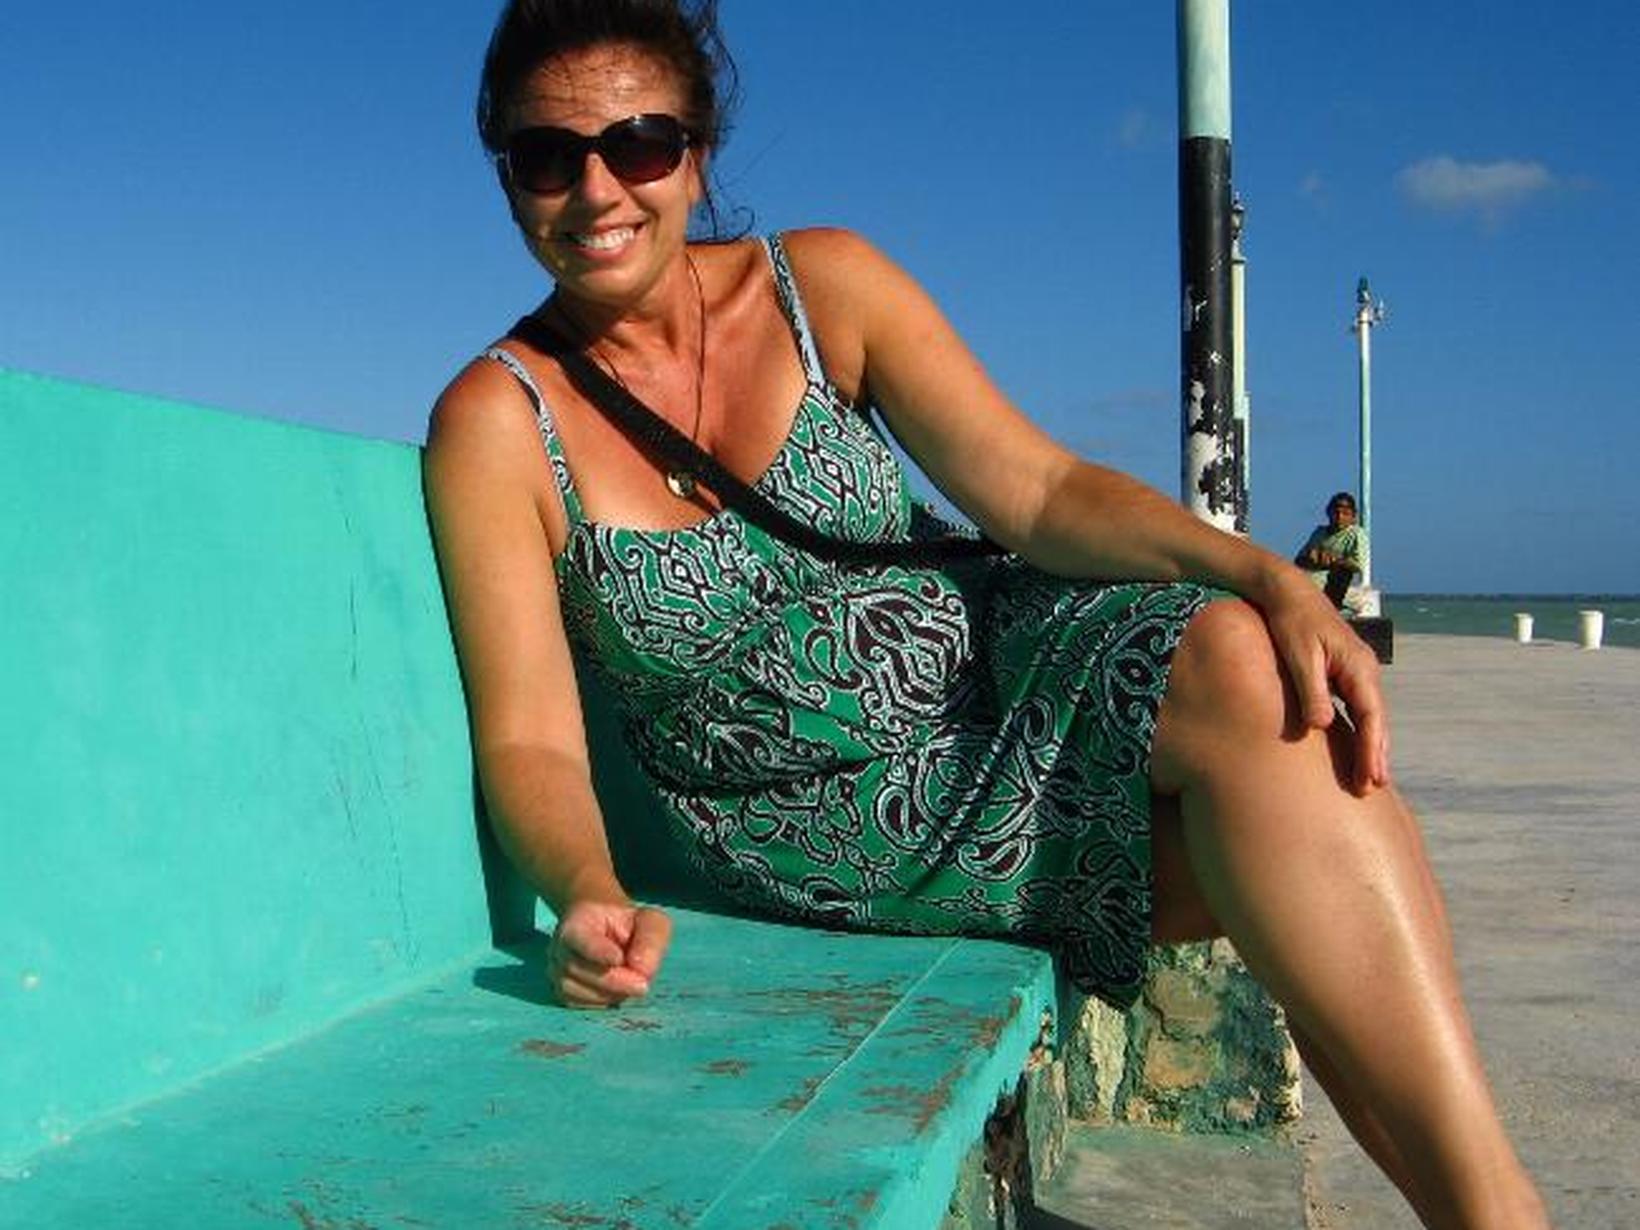 Antonia from Hamilton, Ontario, Canada